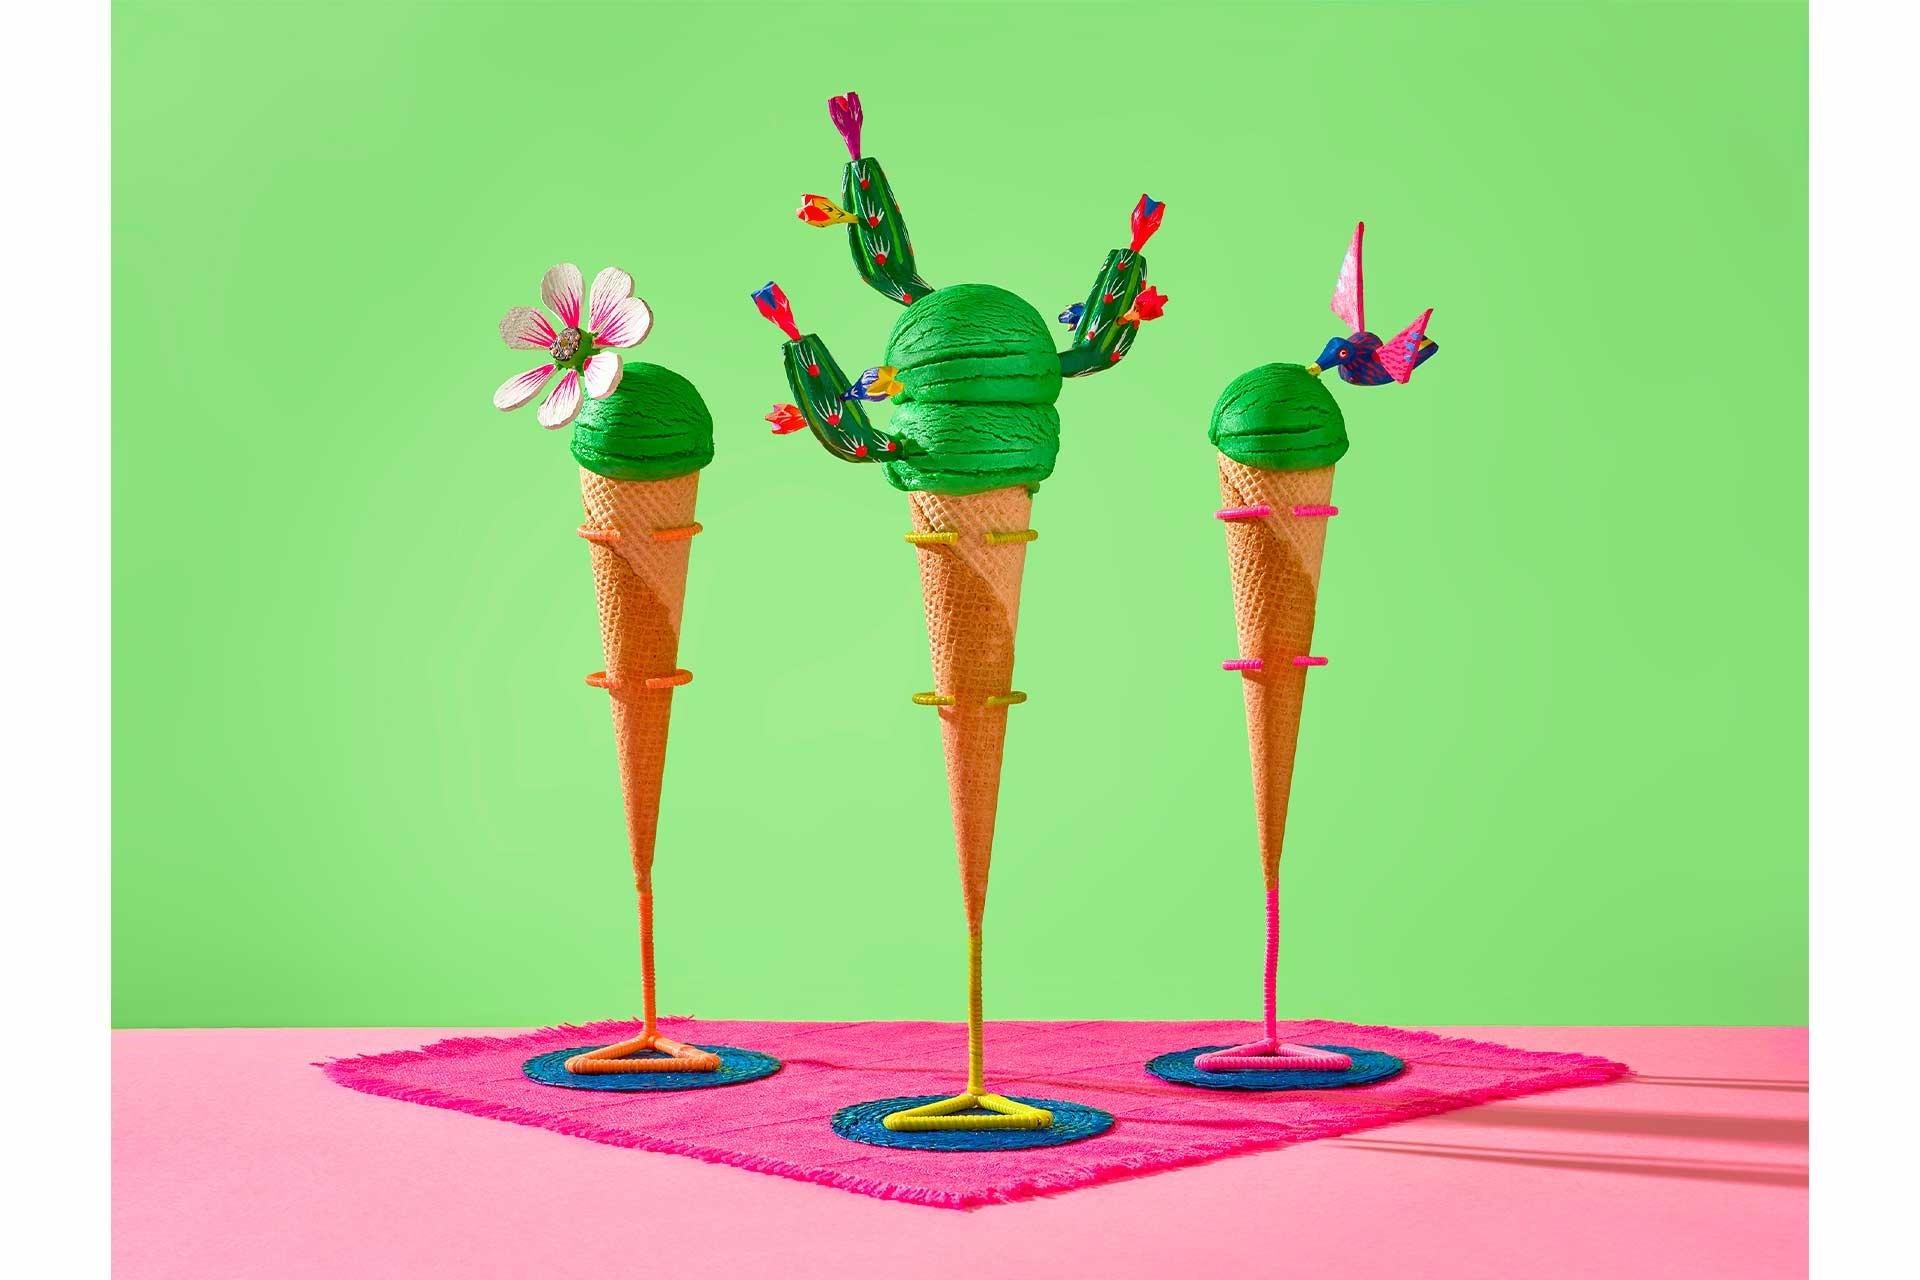 Ice Cream Paloma Rincon